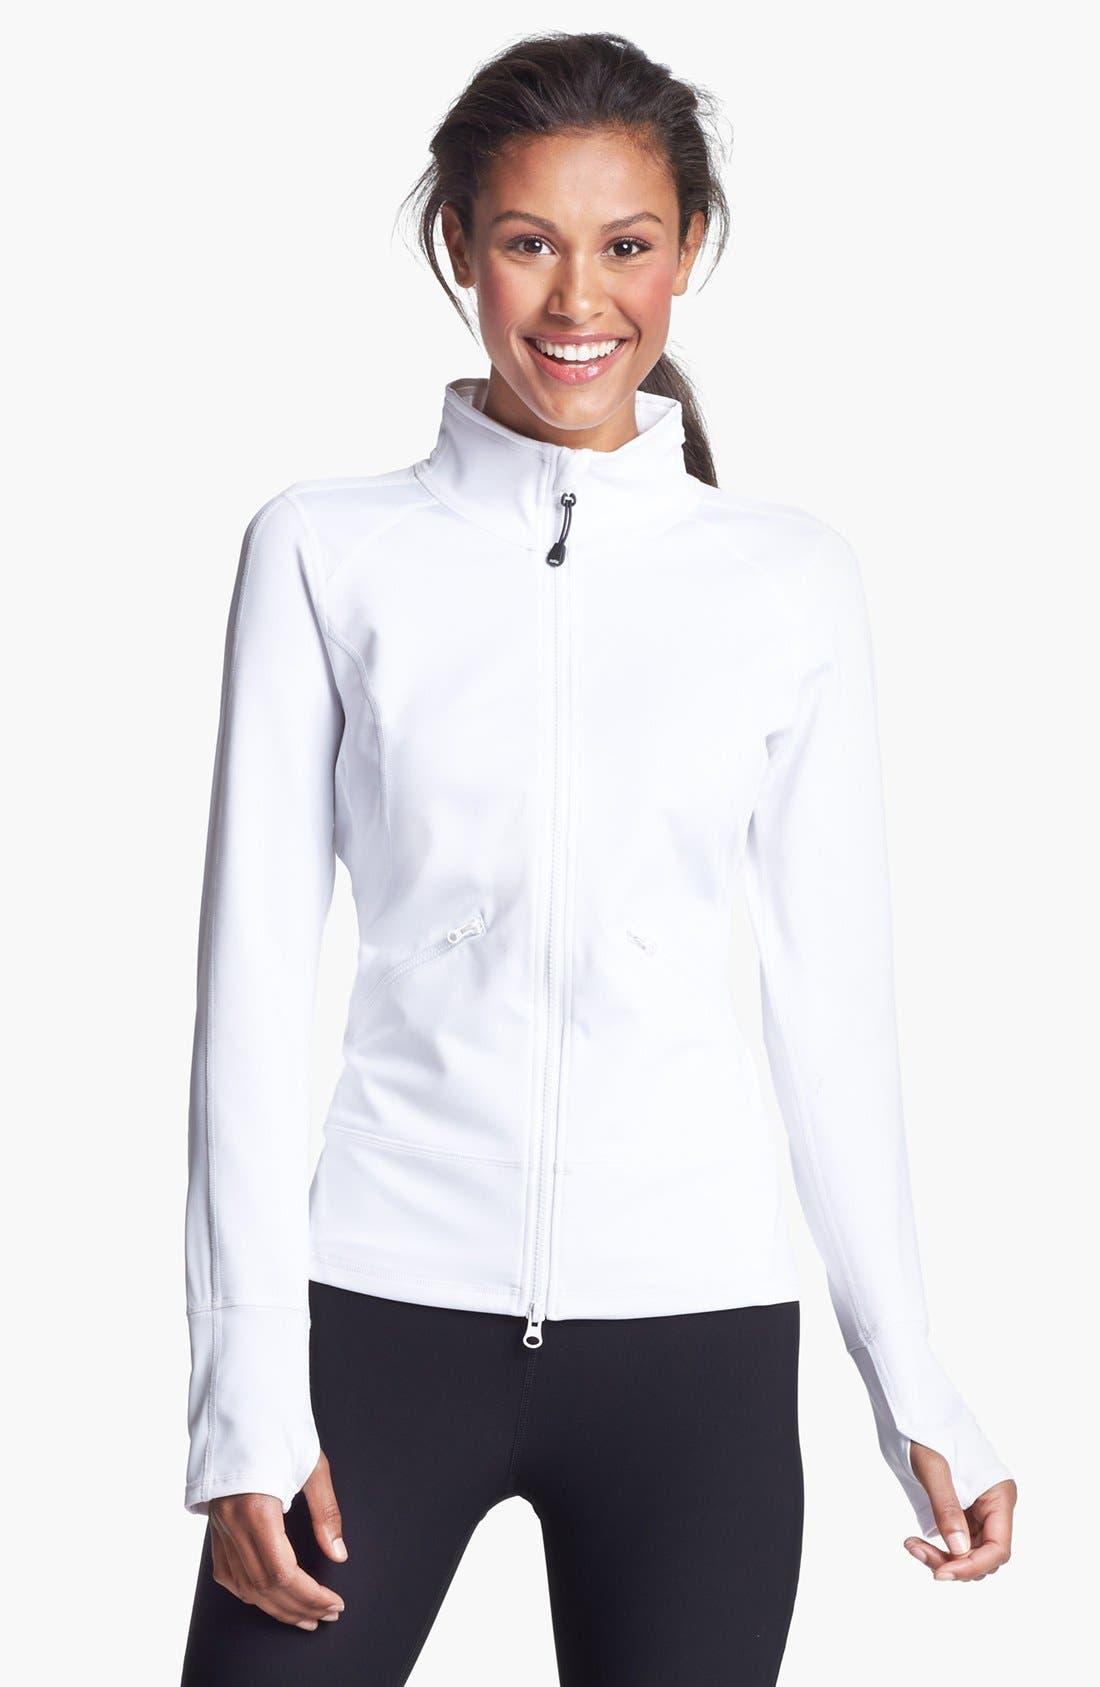 Alternate Image 1 Selected - Zella 'Streamline' Jacket